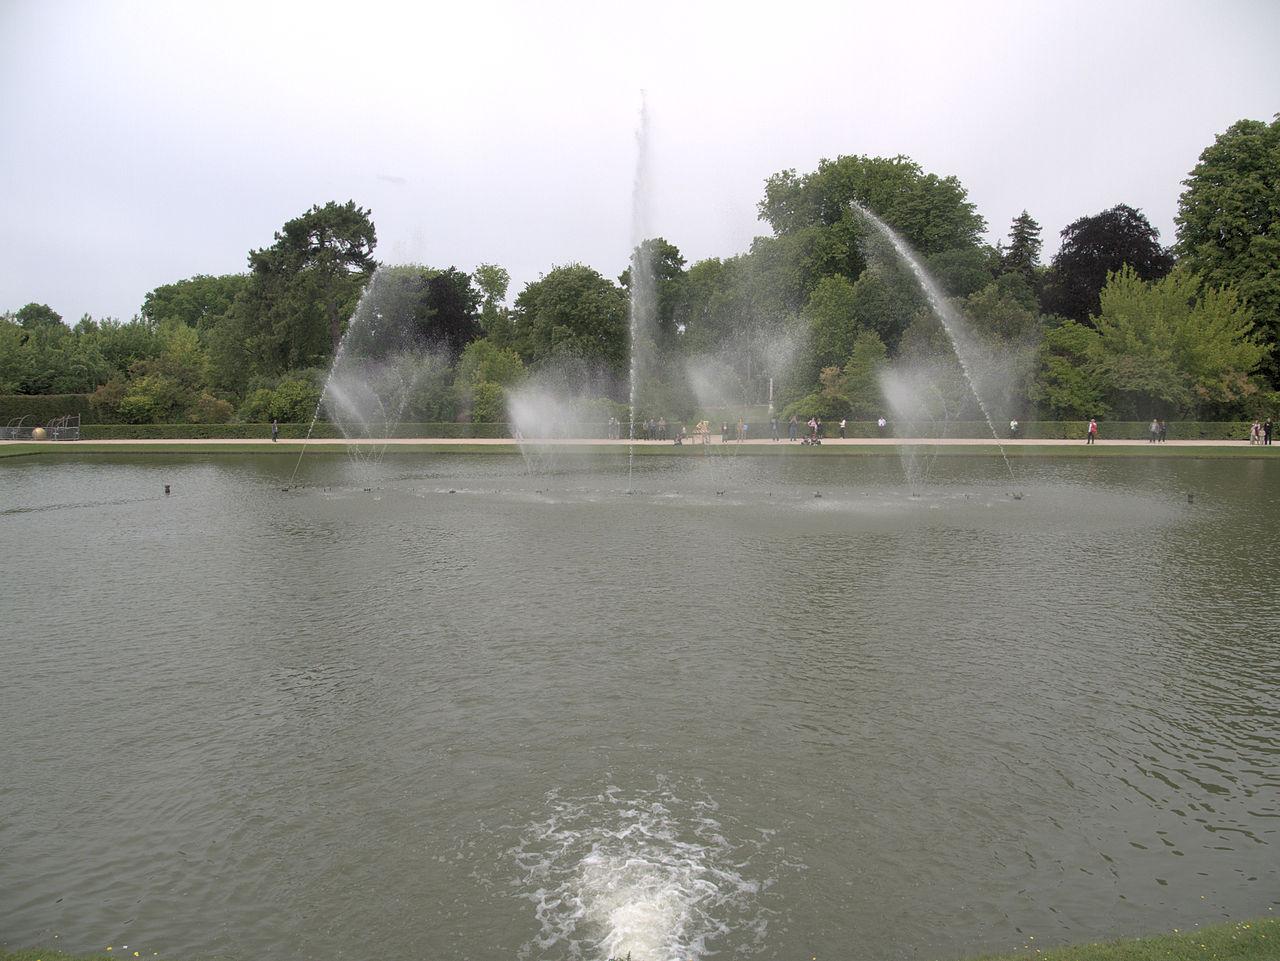 D co bassin du miroir versailles strasbourg 31 for Bassin miroir